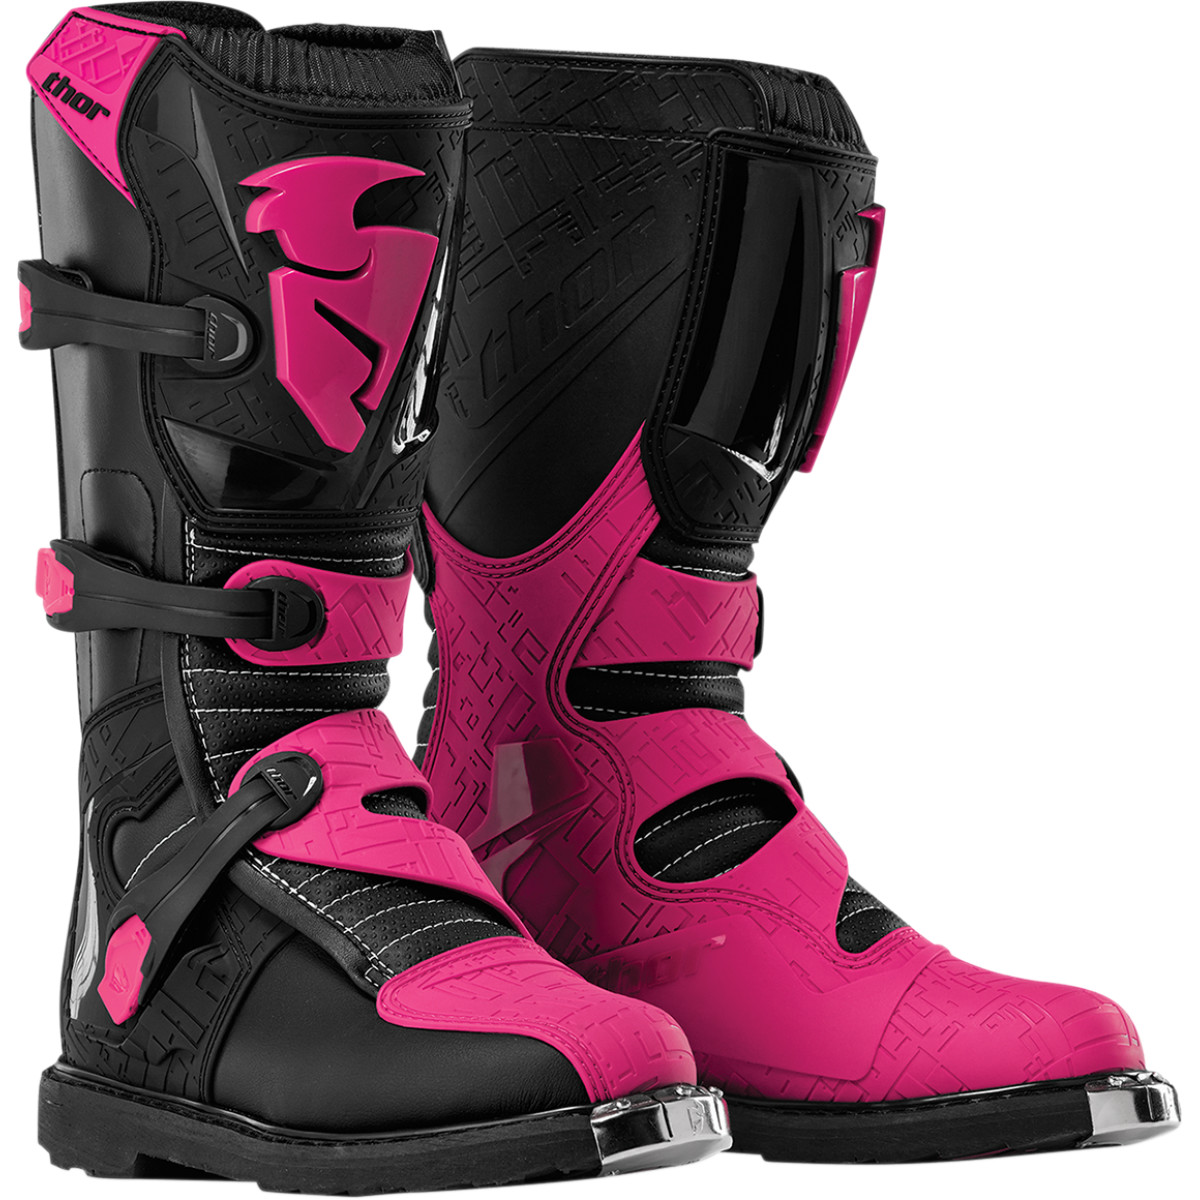 Thor Blitz Boot Offroad (Multi Black/Pink, USA SIZE 5)